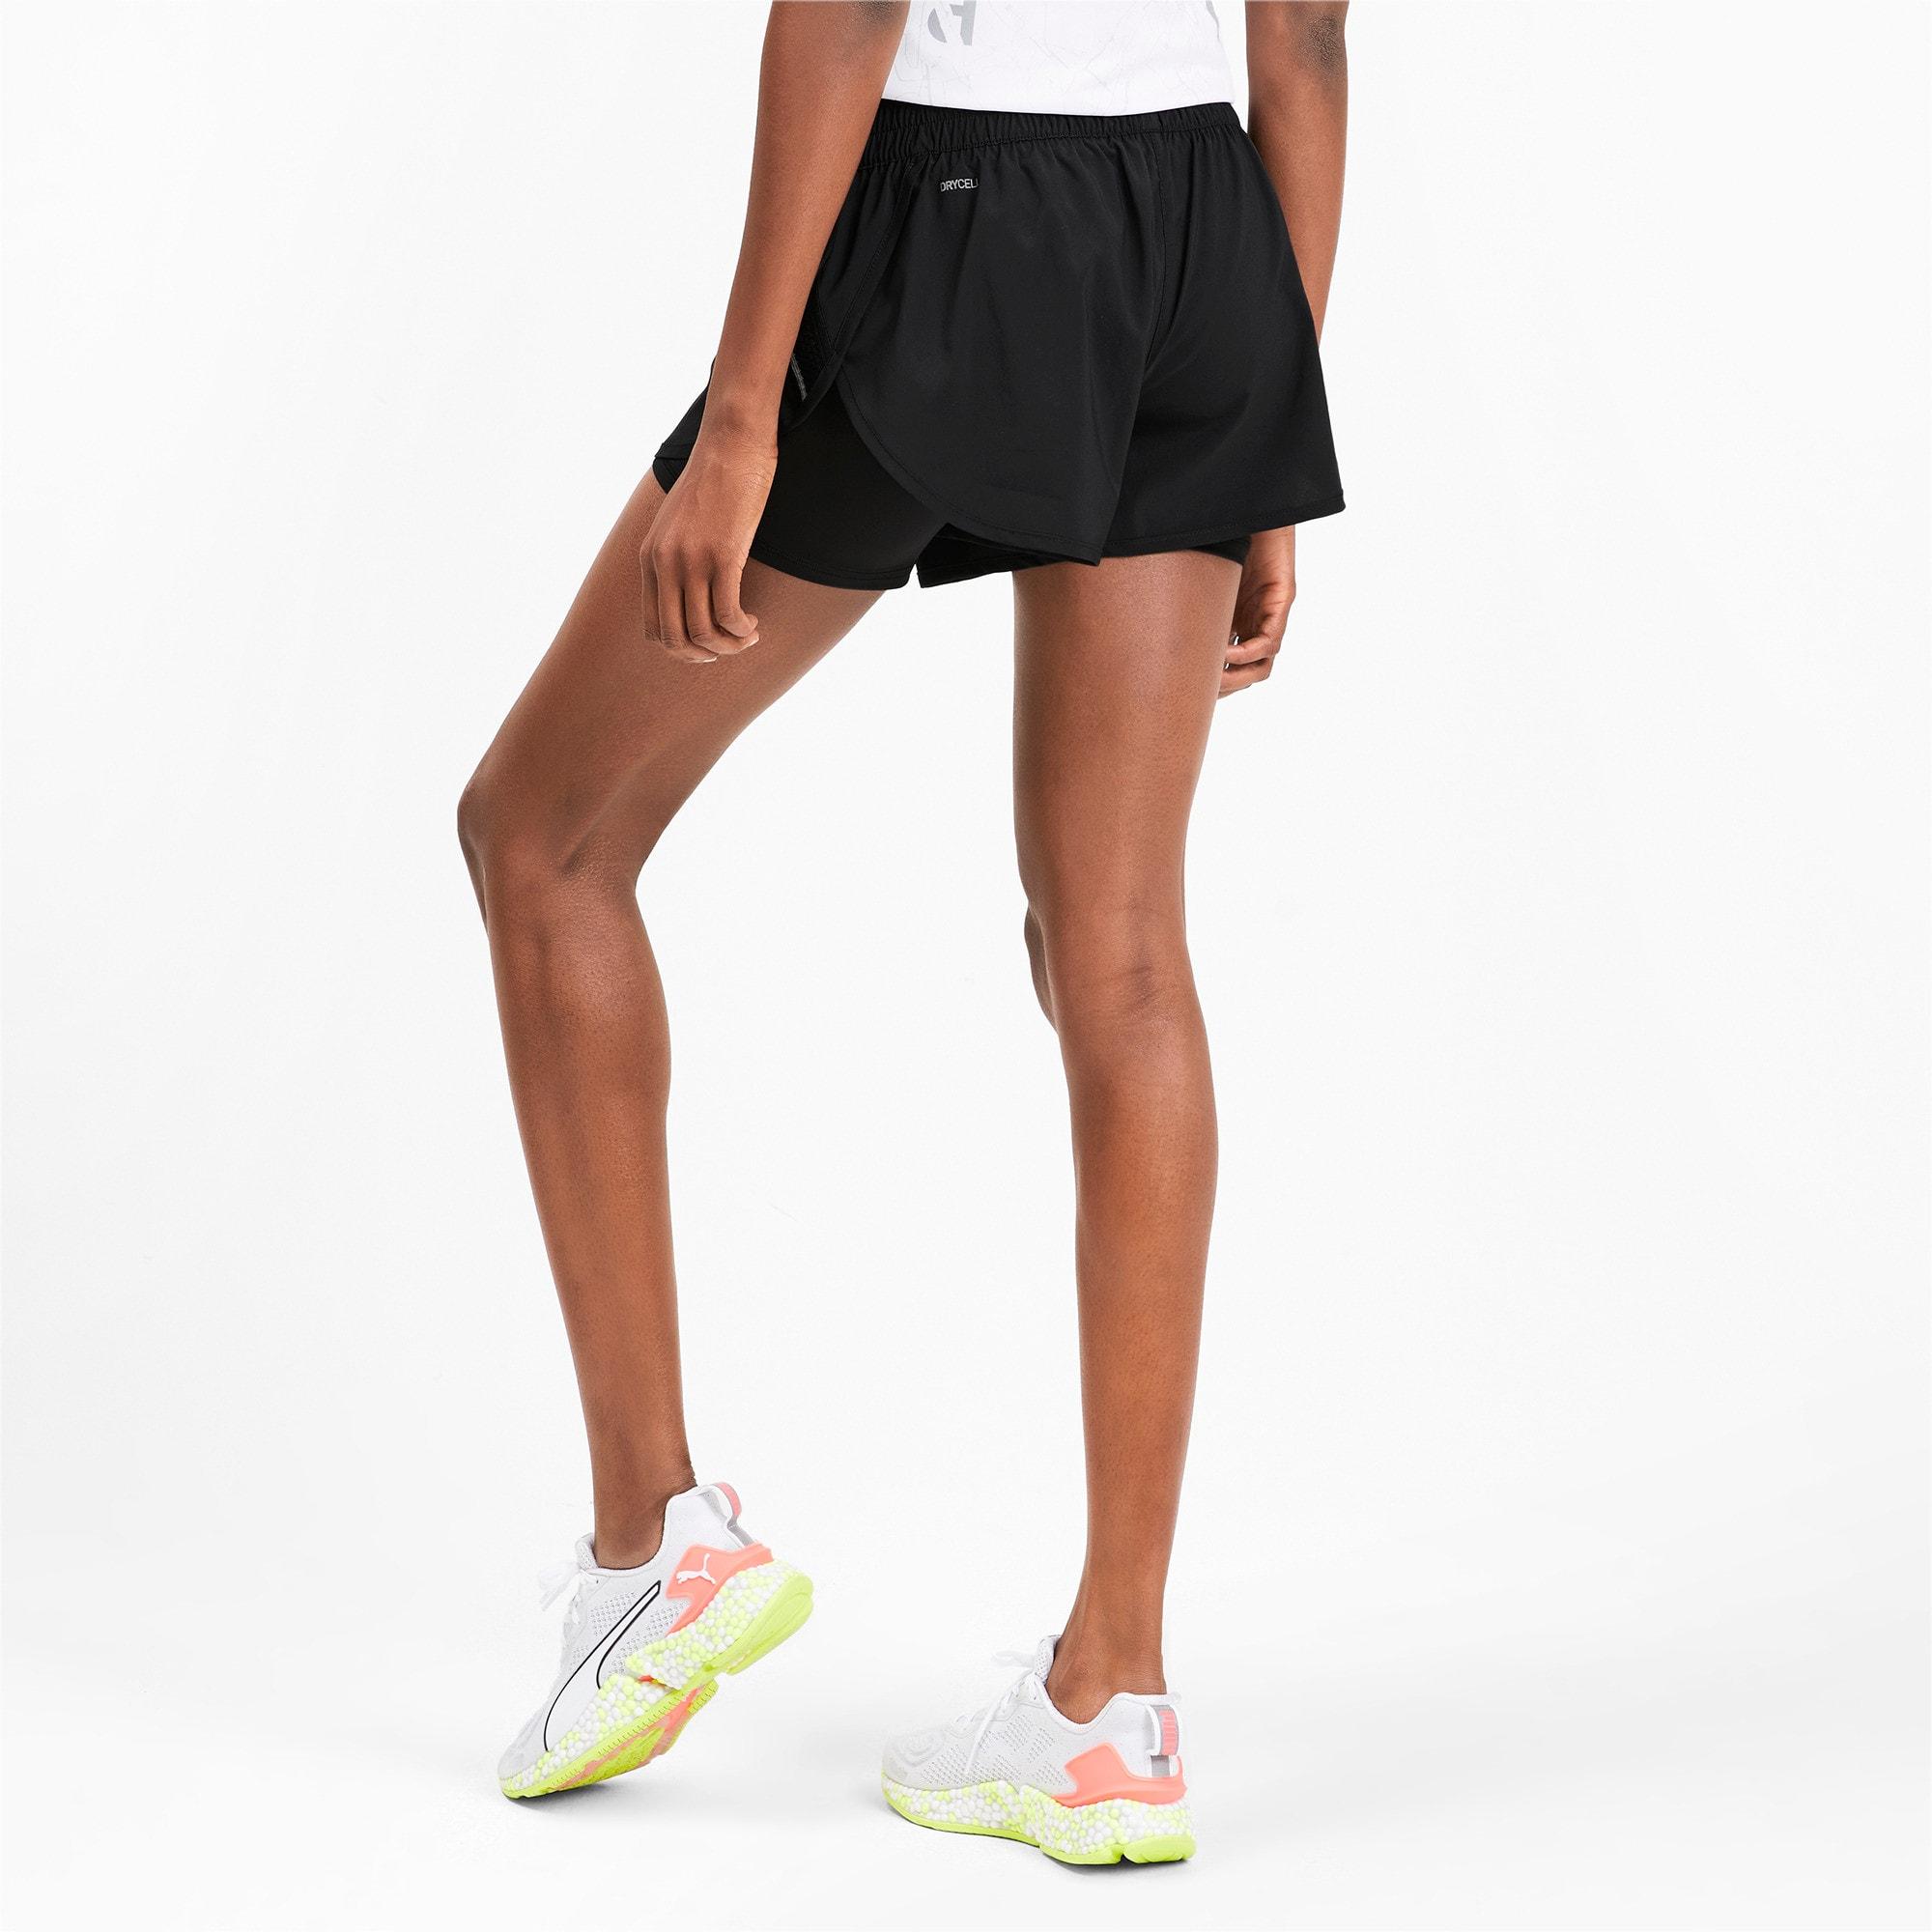 Thumbnail 2 of ADHM 2019 Last Lap Woven 2 in 1 Women's Running Shorts, Puma Black-Puma Black, medium-IND